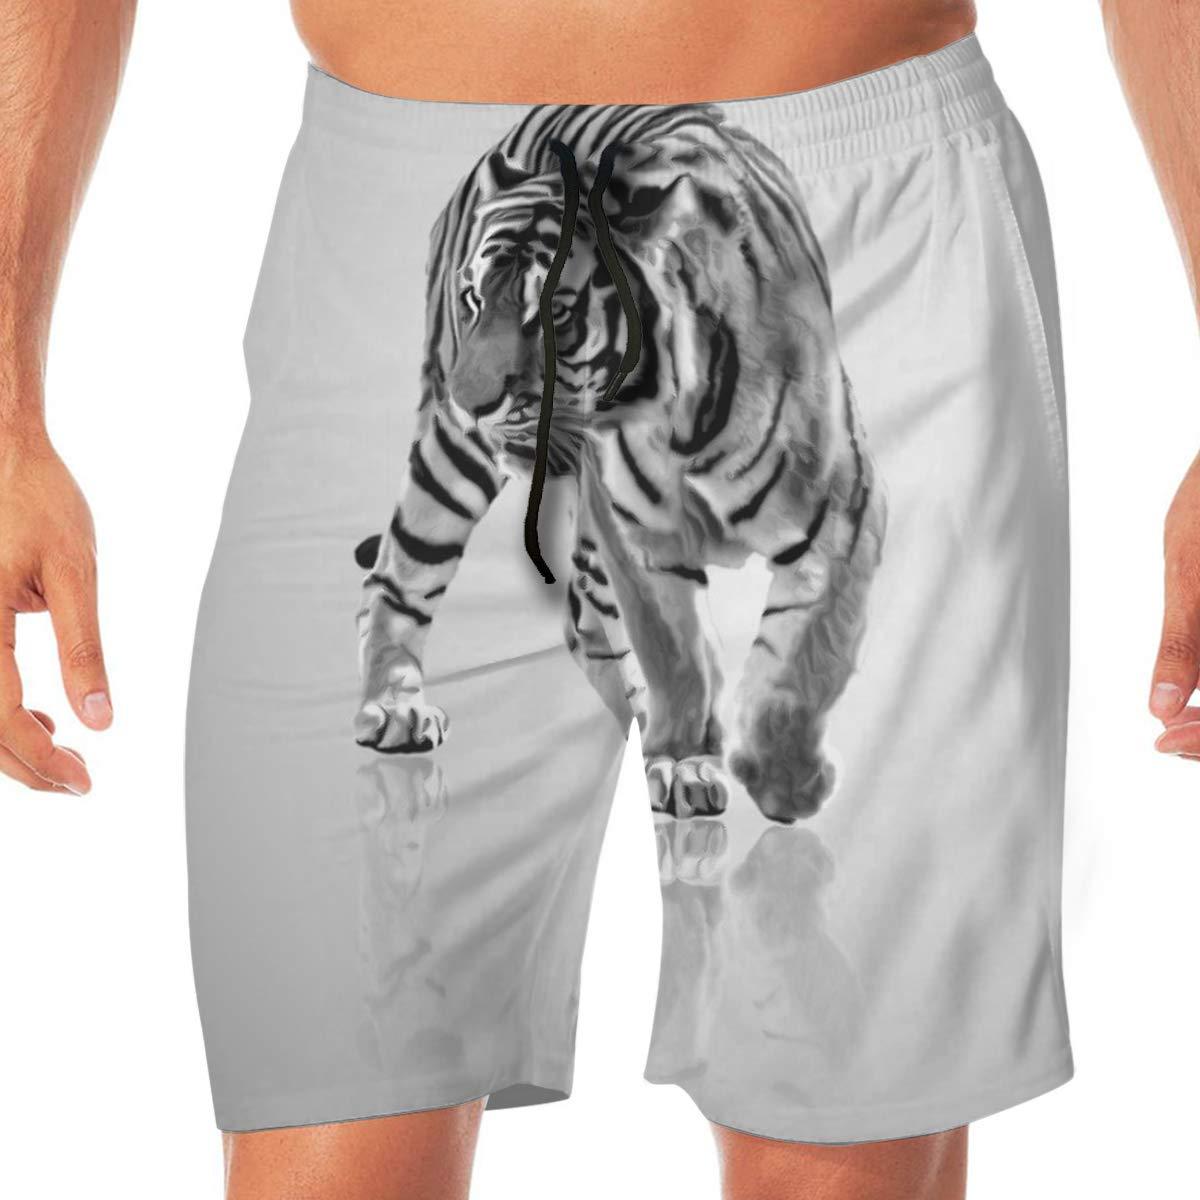 White Tiger Funny Summer Quick-Drying Swim Trunks Beach Shorts Cargo Shorts